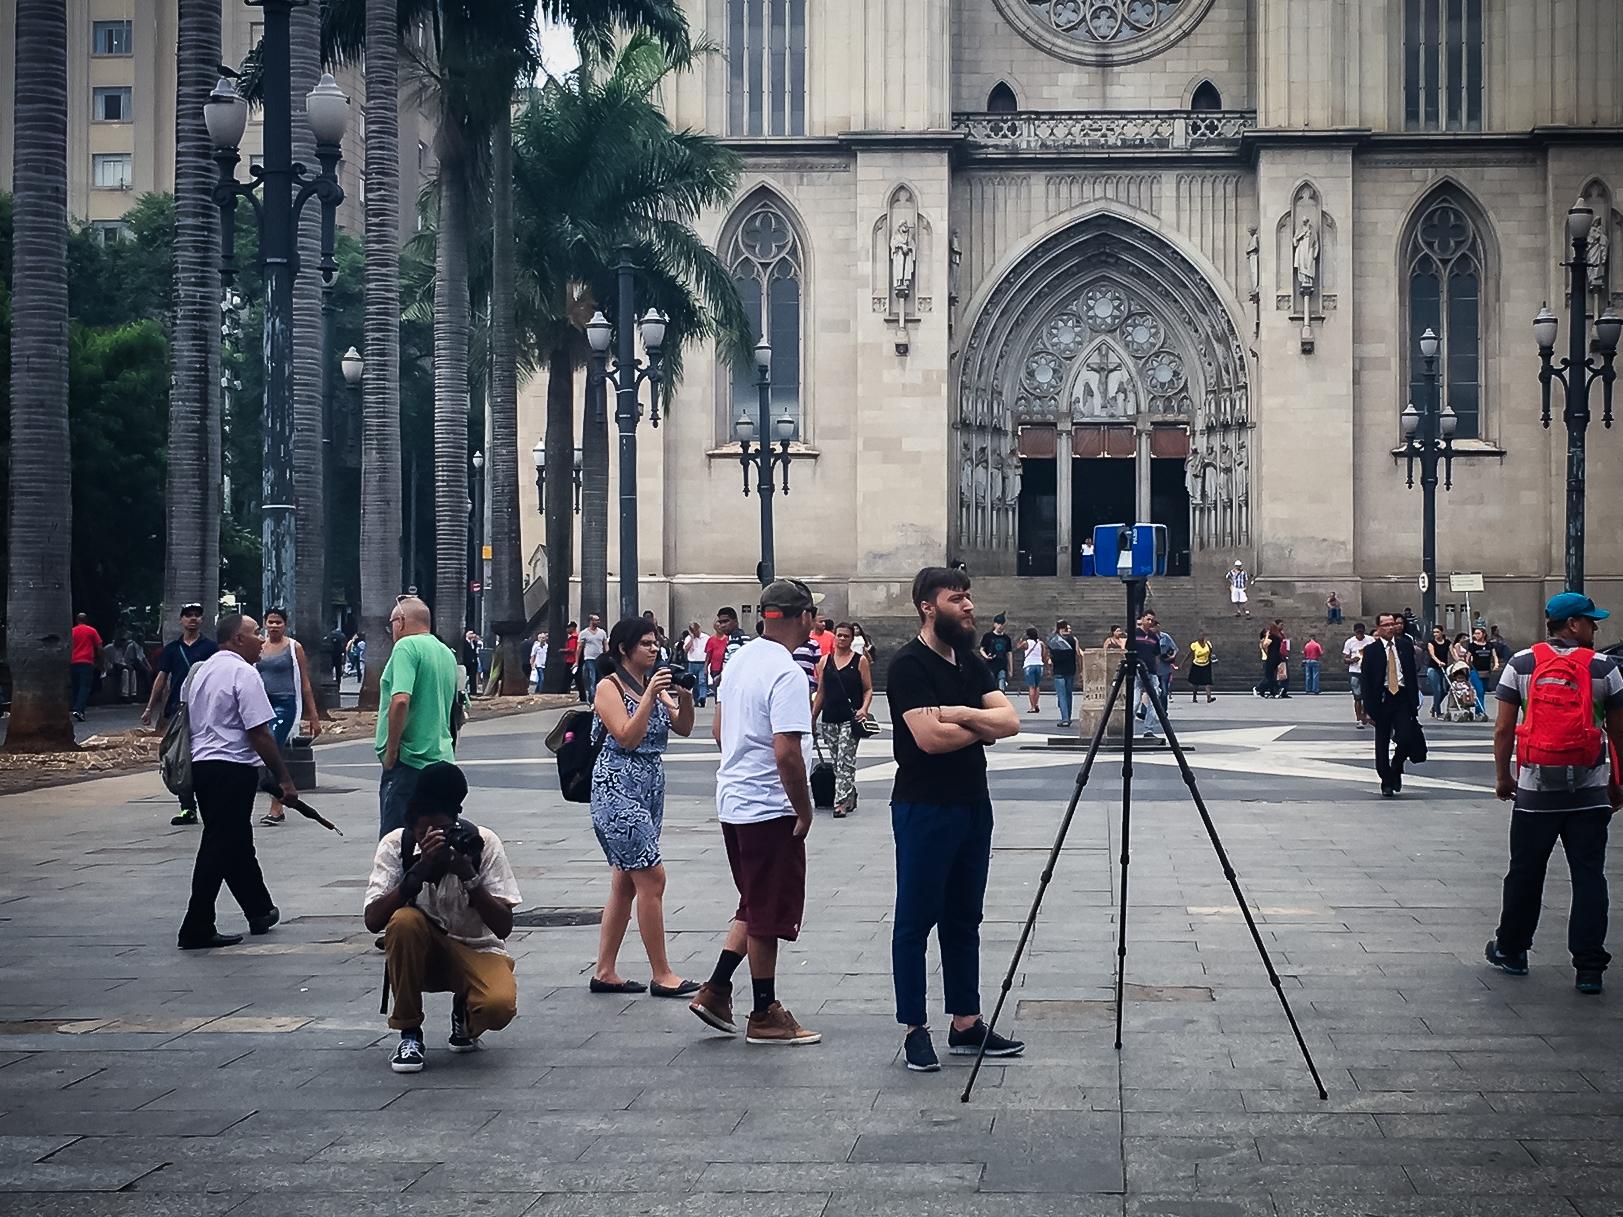 Using the Lidar scanner in central São Paulo